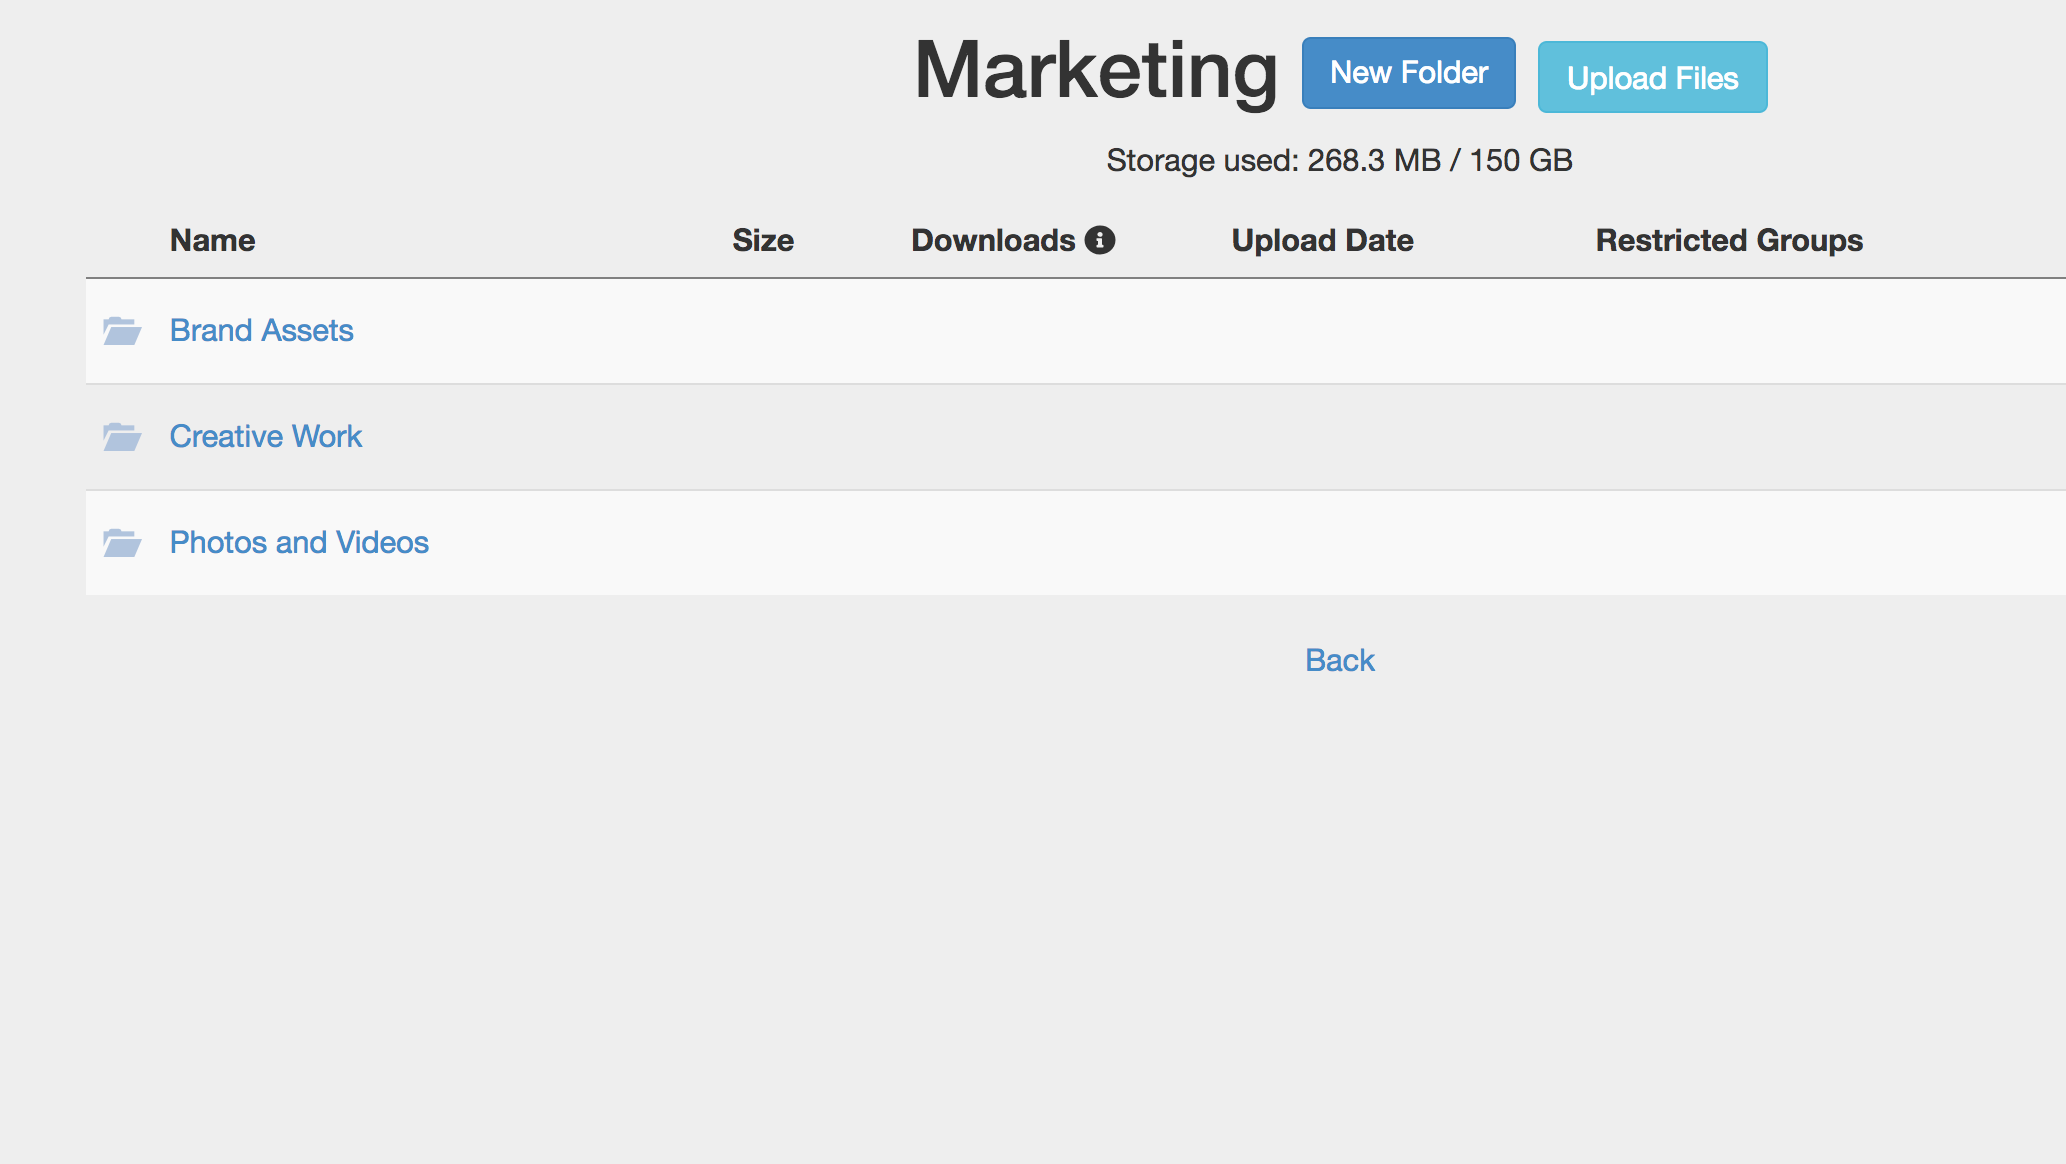 Marketing Files